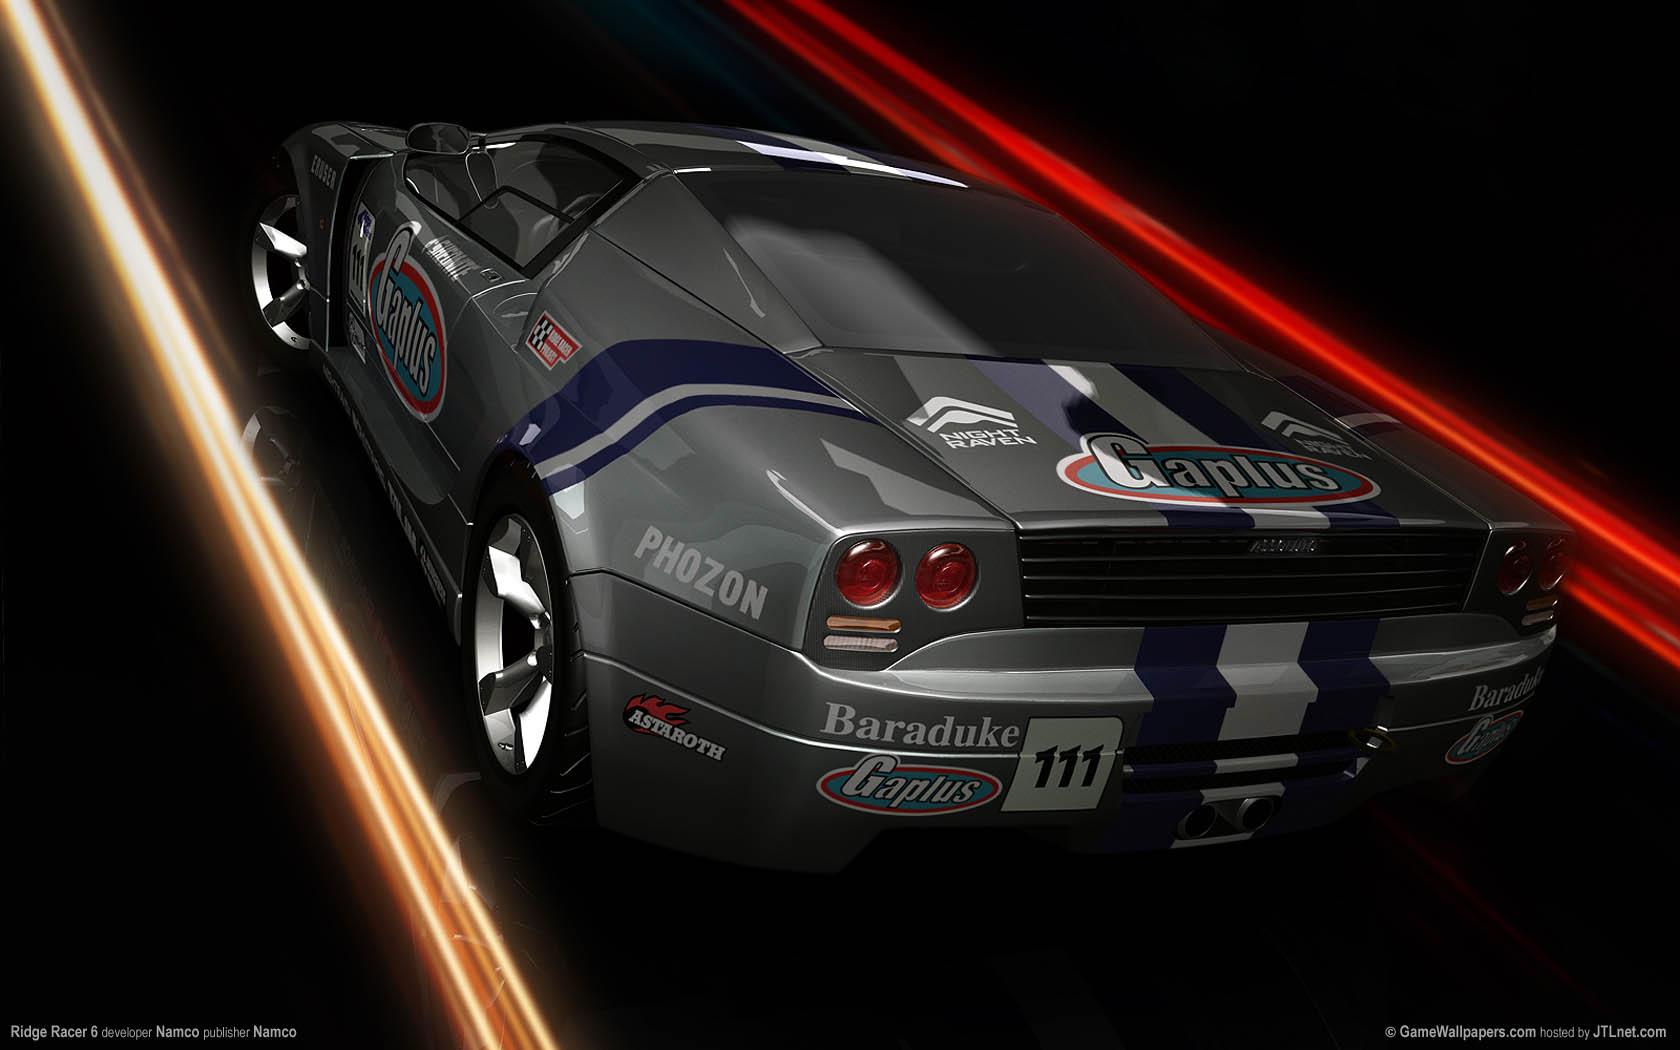 Ridge Racer 6 Hintergrundbild 05 1680x1050